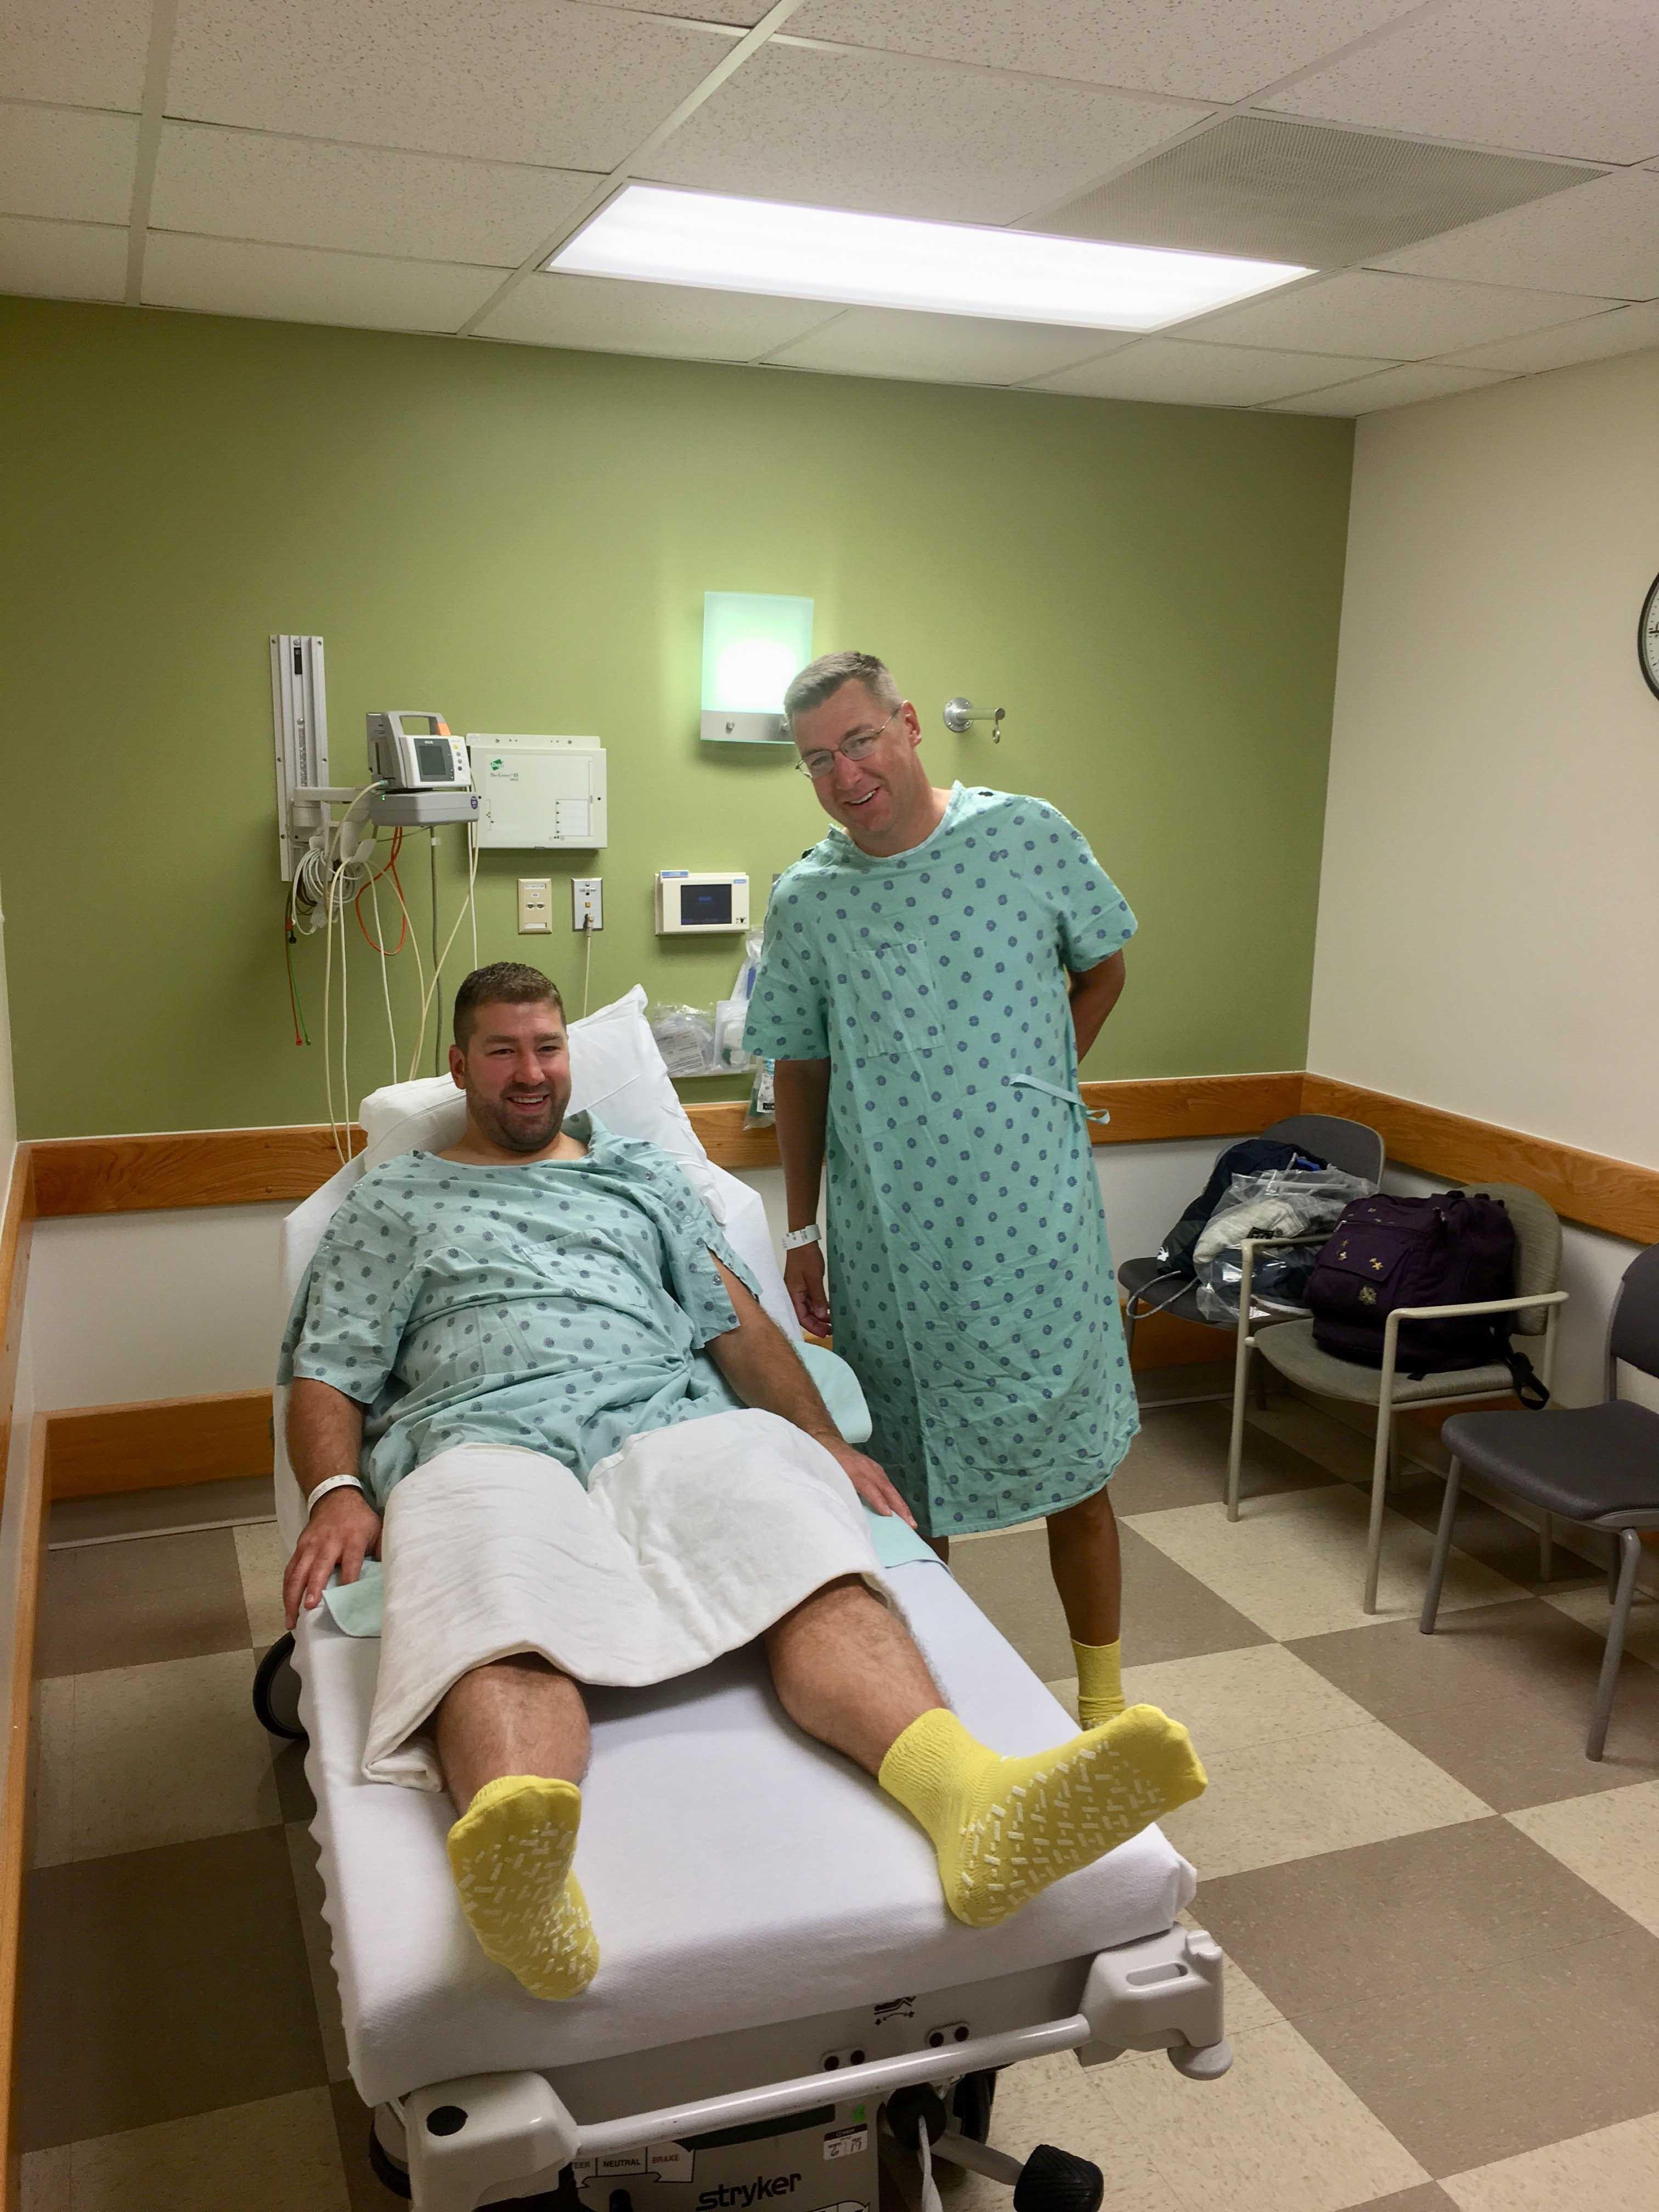 Greg and Mark at the hospital